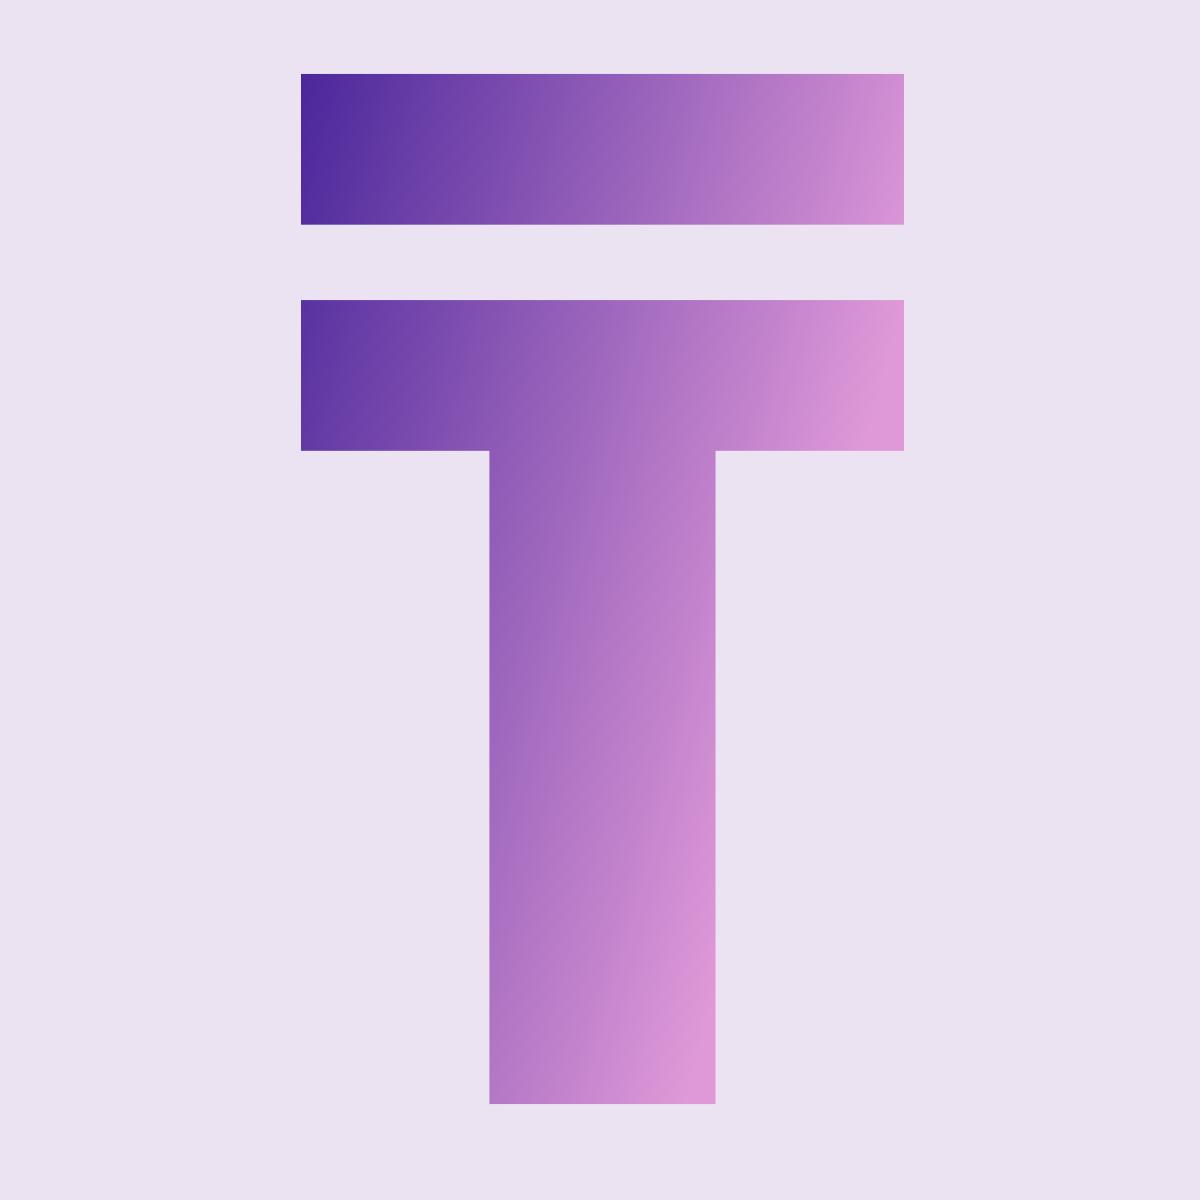 Tron Gainer logo